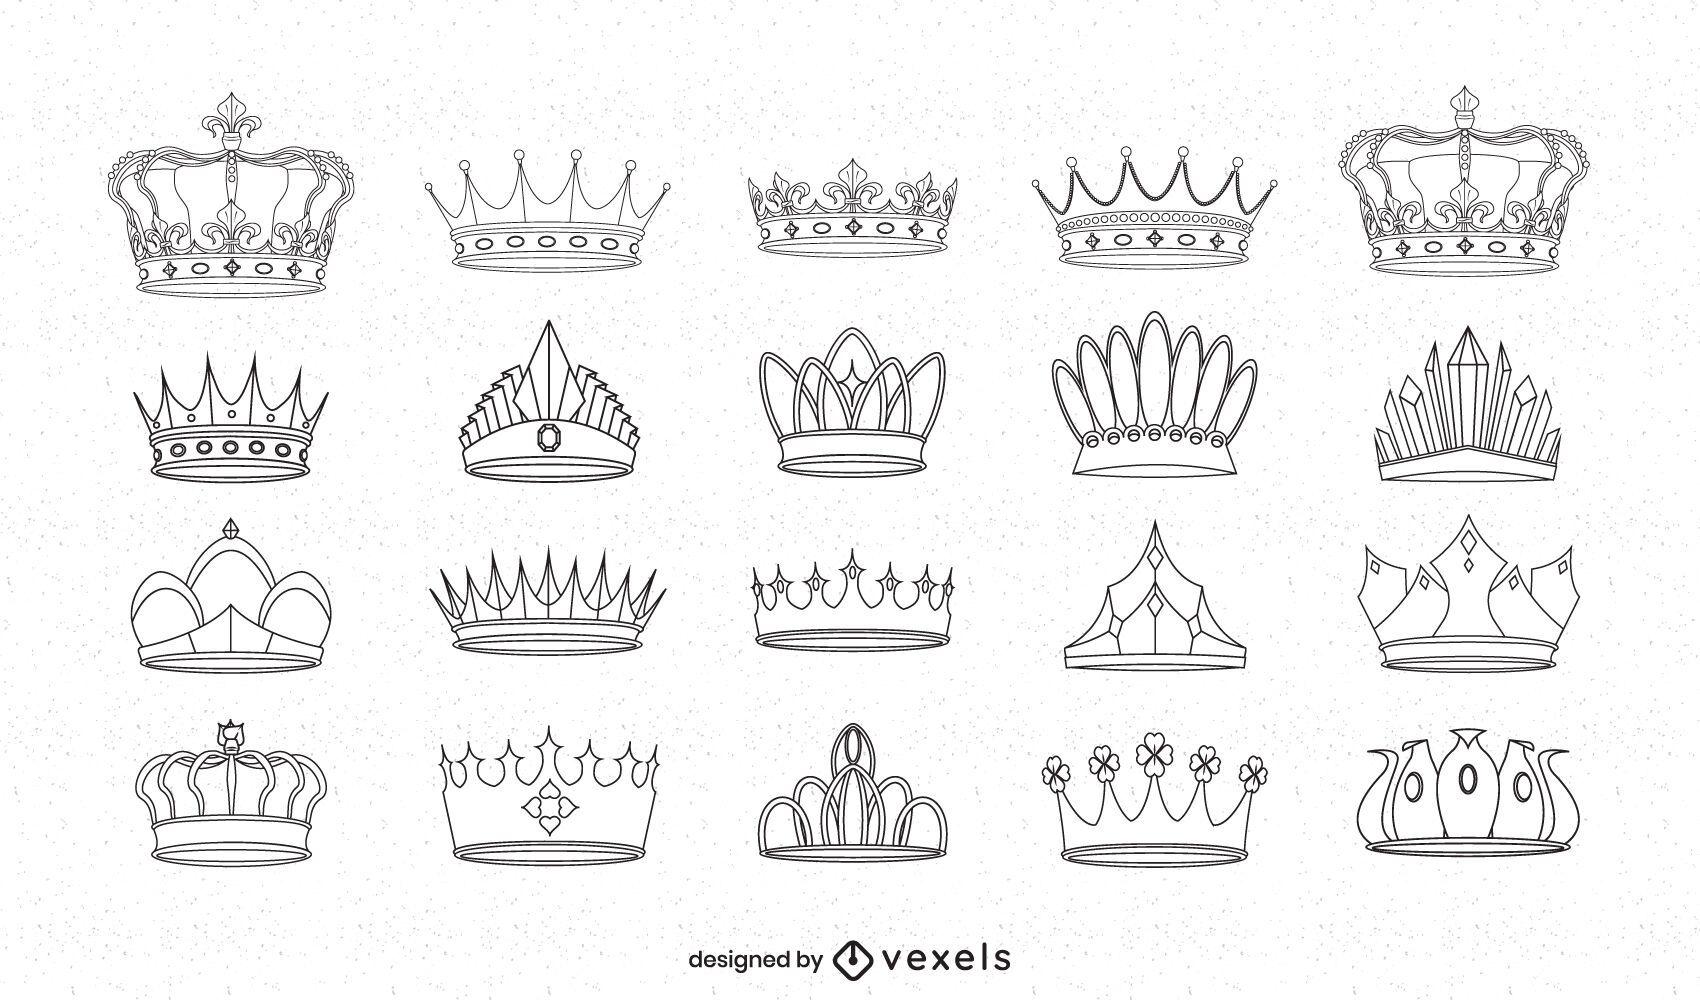 Royal crowns kingdom line art set